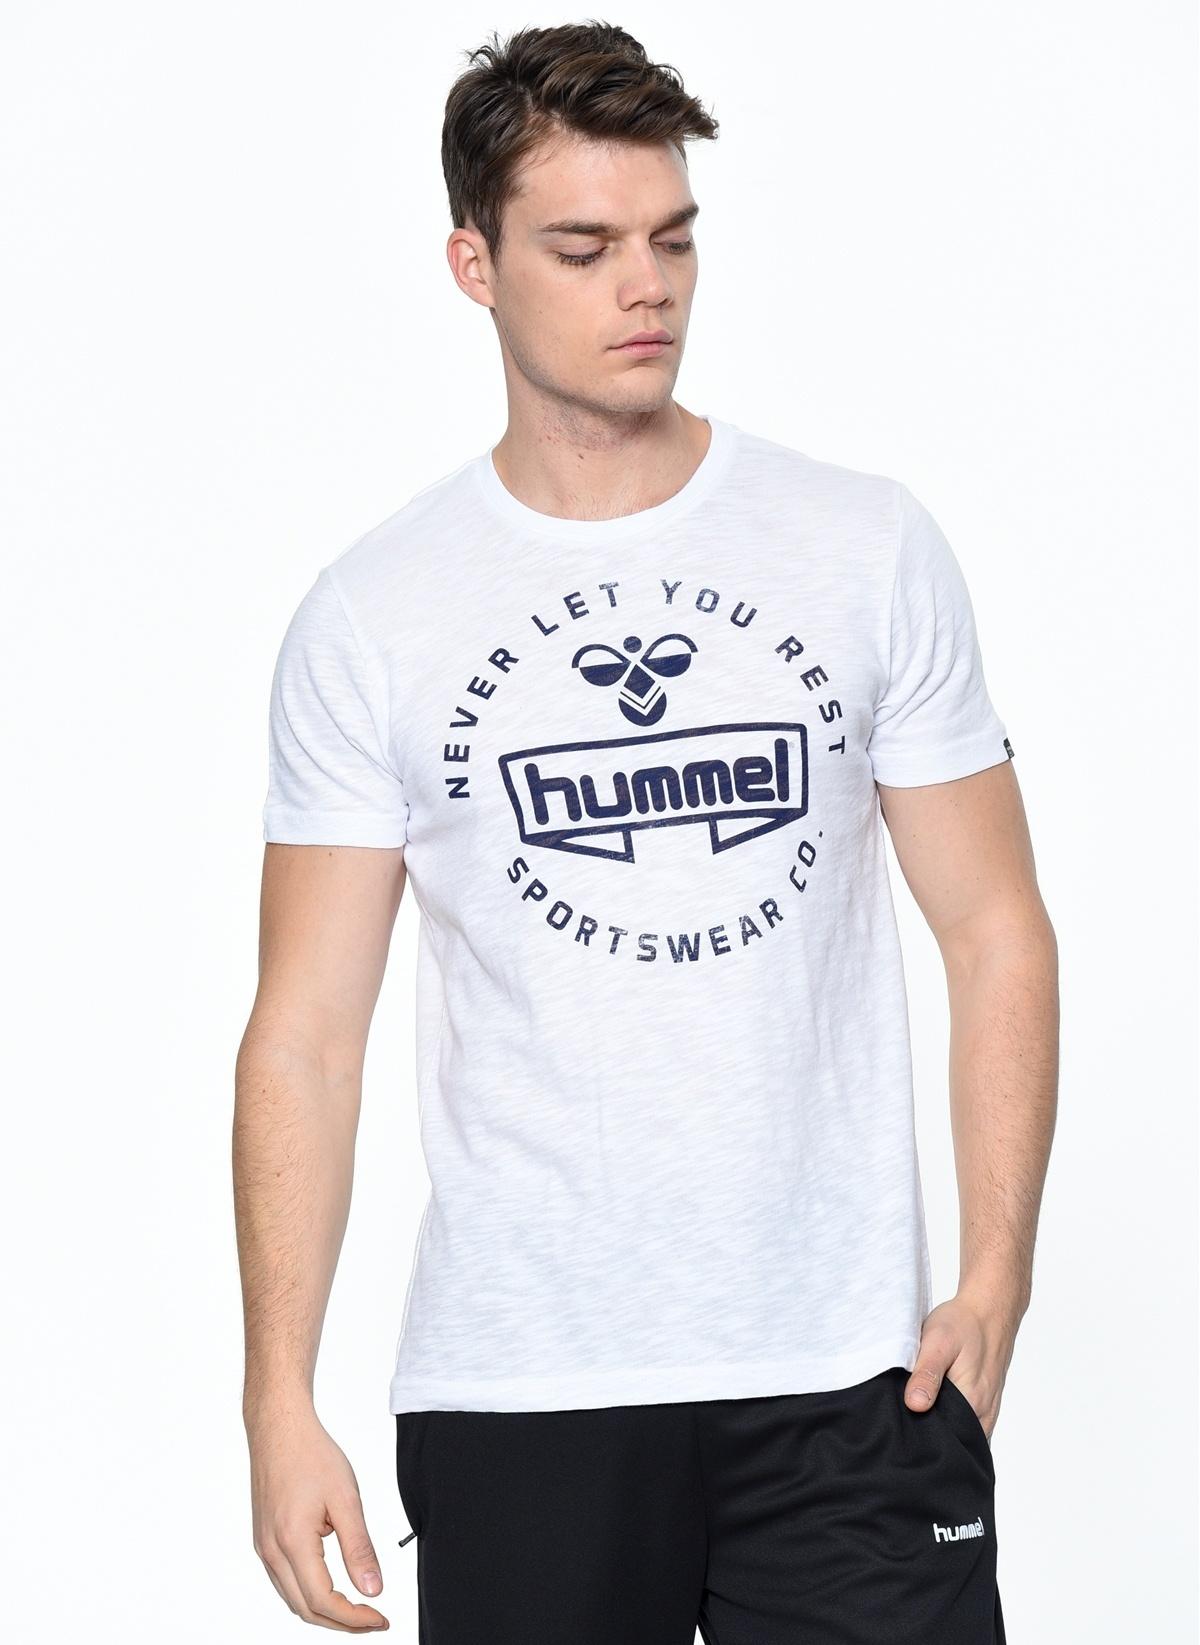 Hummel Tişört 910535-9001 Hmlflinn T-shirt S – S – 79.95 TL